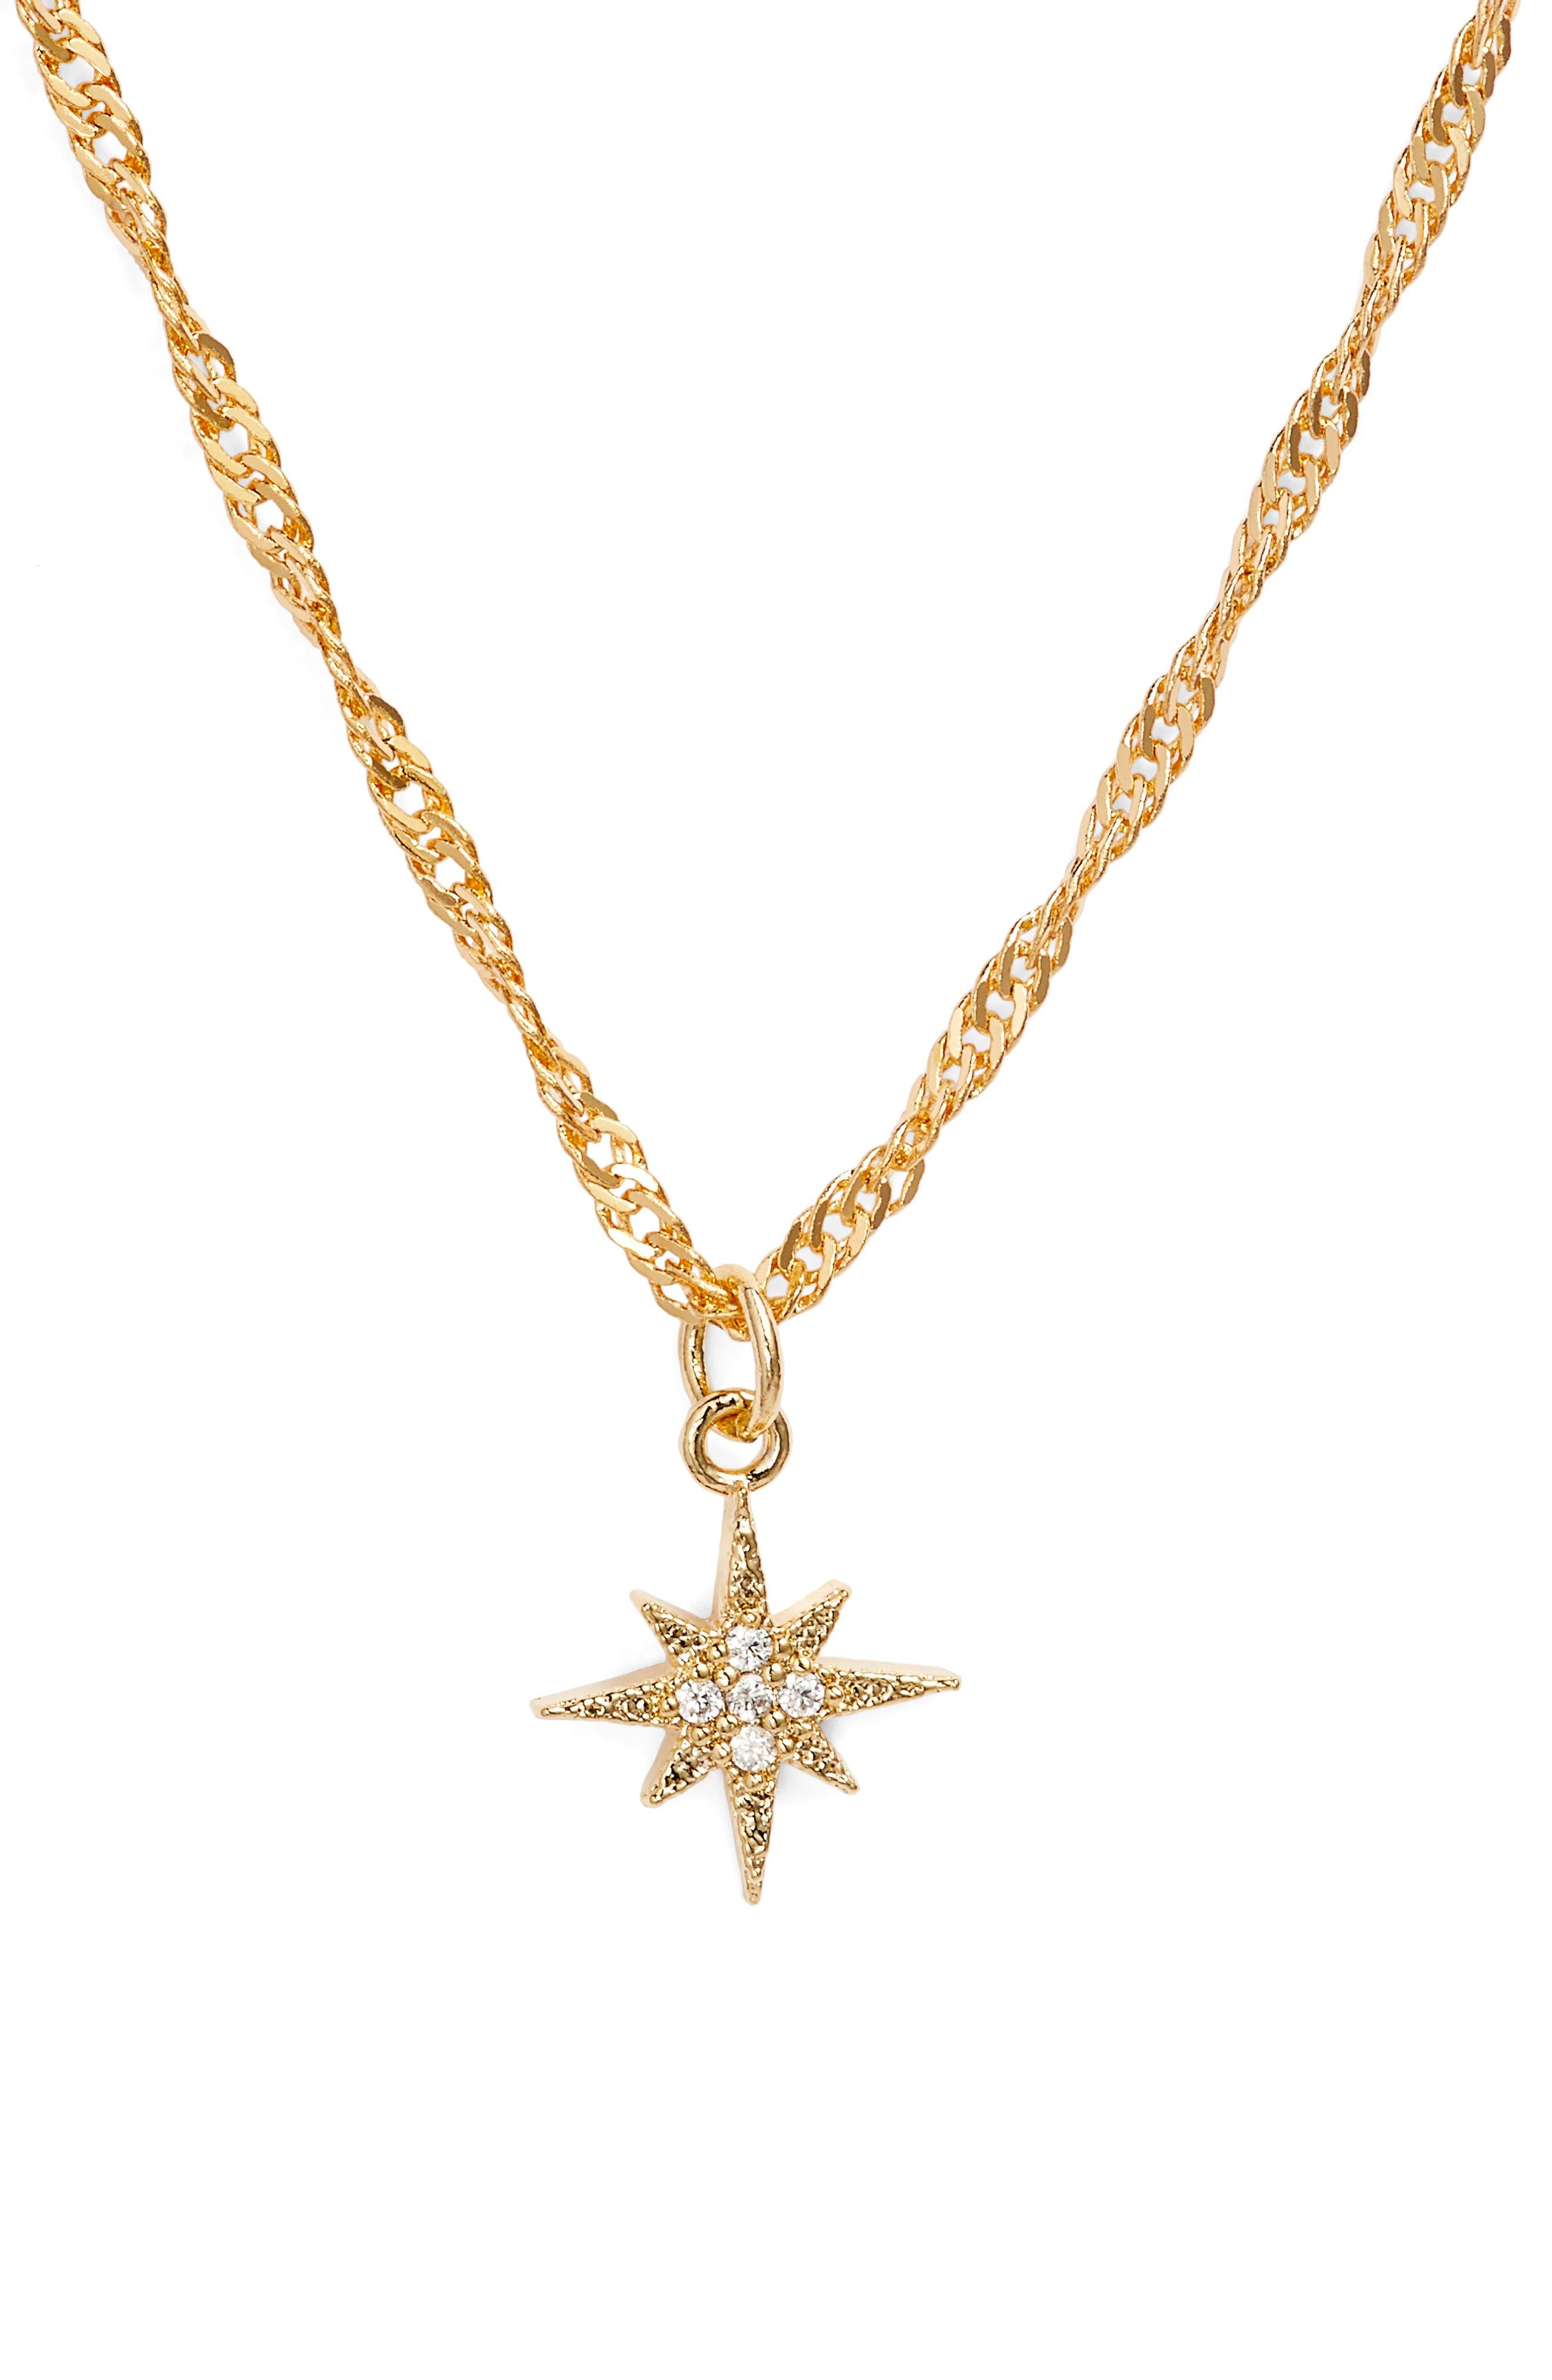 Yolanda Layered Necklace,                             Alternate thumbnail 2, color,                             GOLD